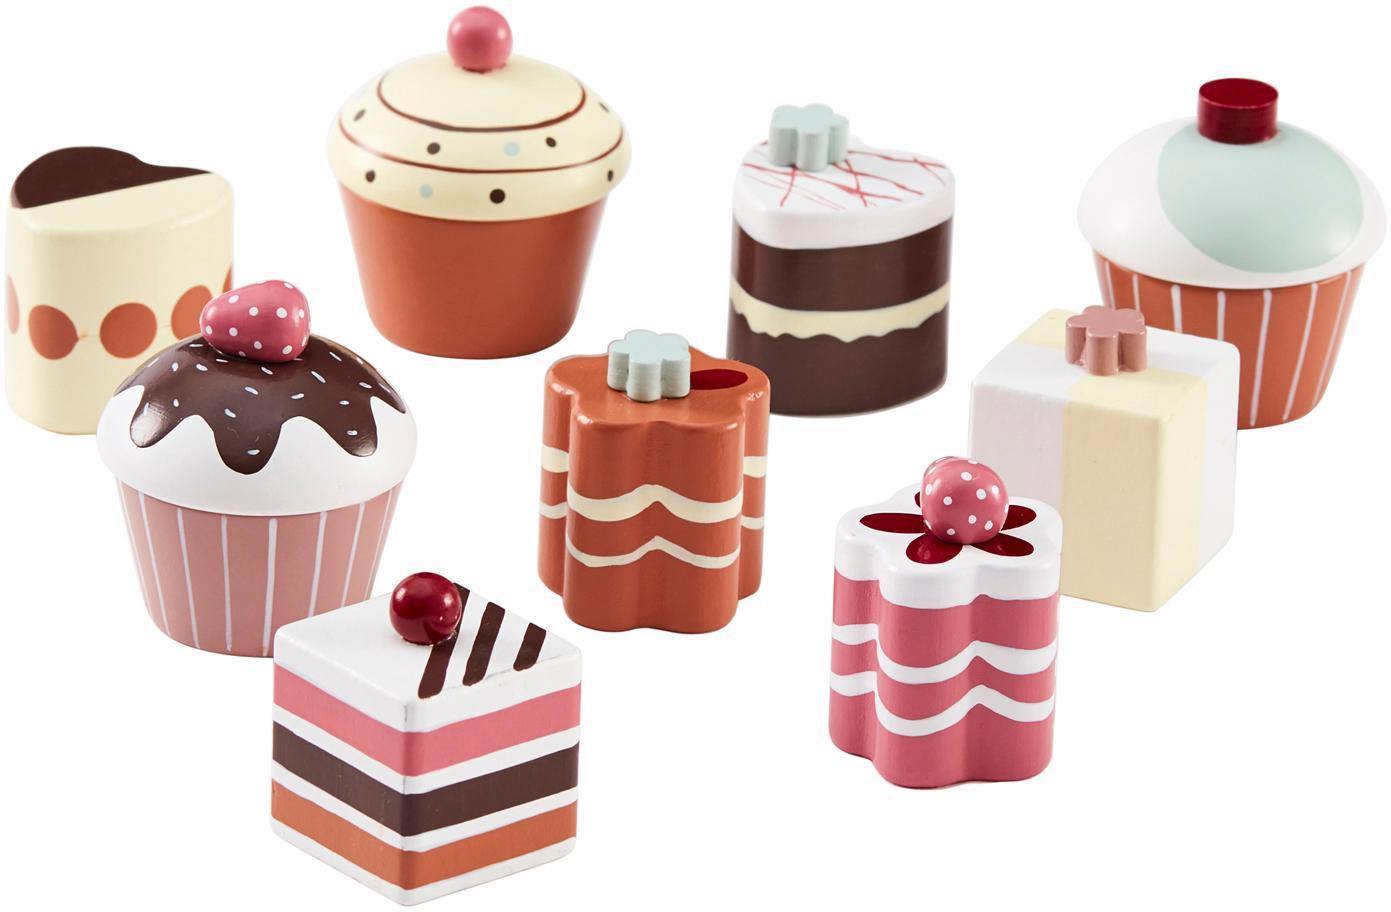 Spielzeug-Set Sweets, Schimaholz, lackiert, Mehrfarbig, Ø 5 x H 5 cm